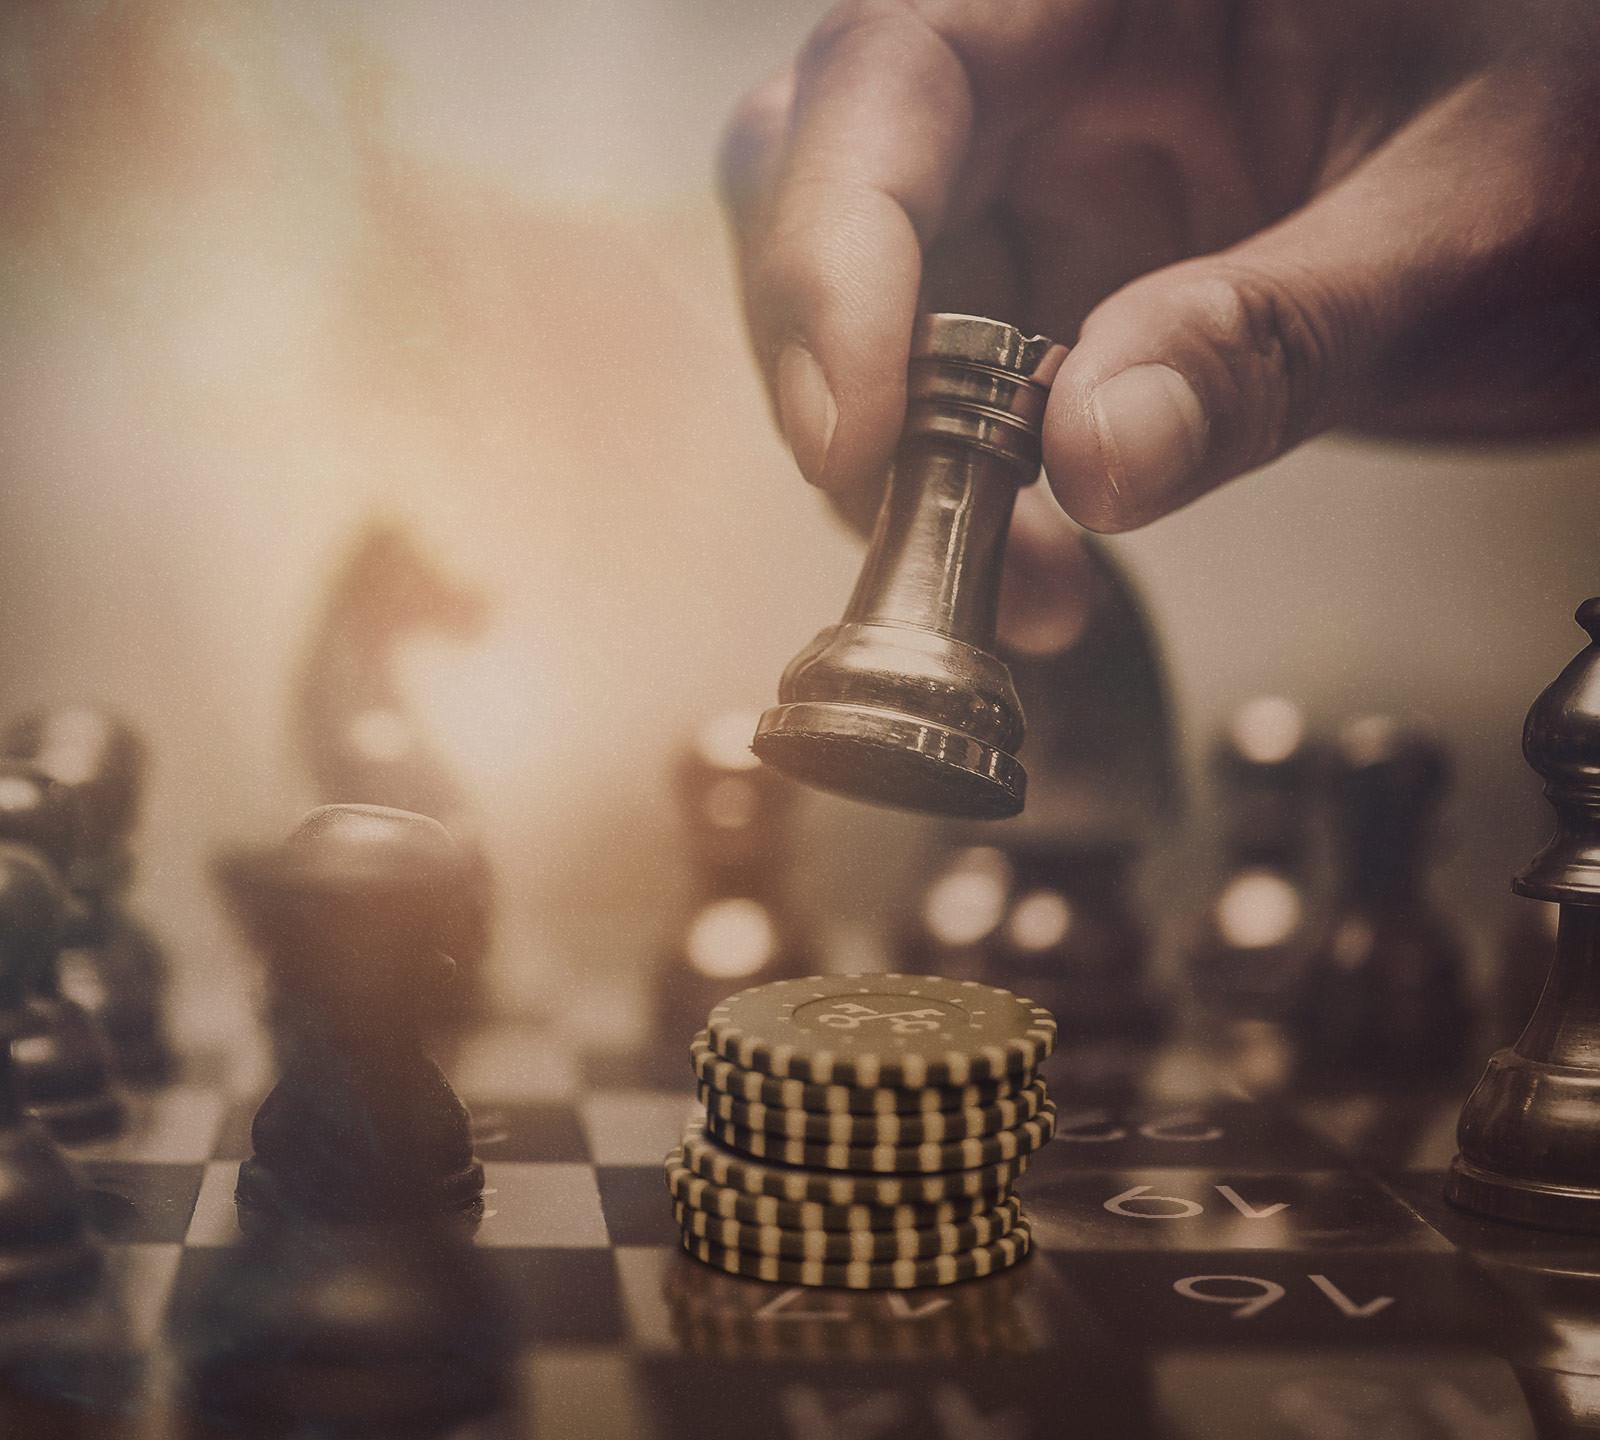 Шахматы — поставь мат рулетке